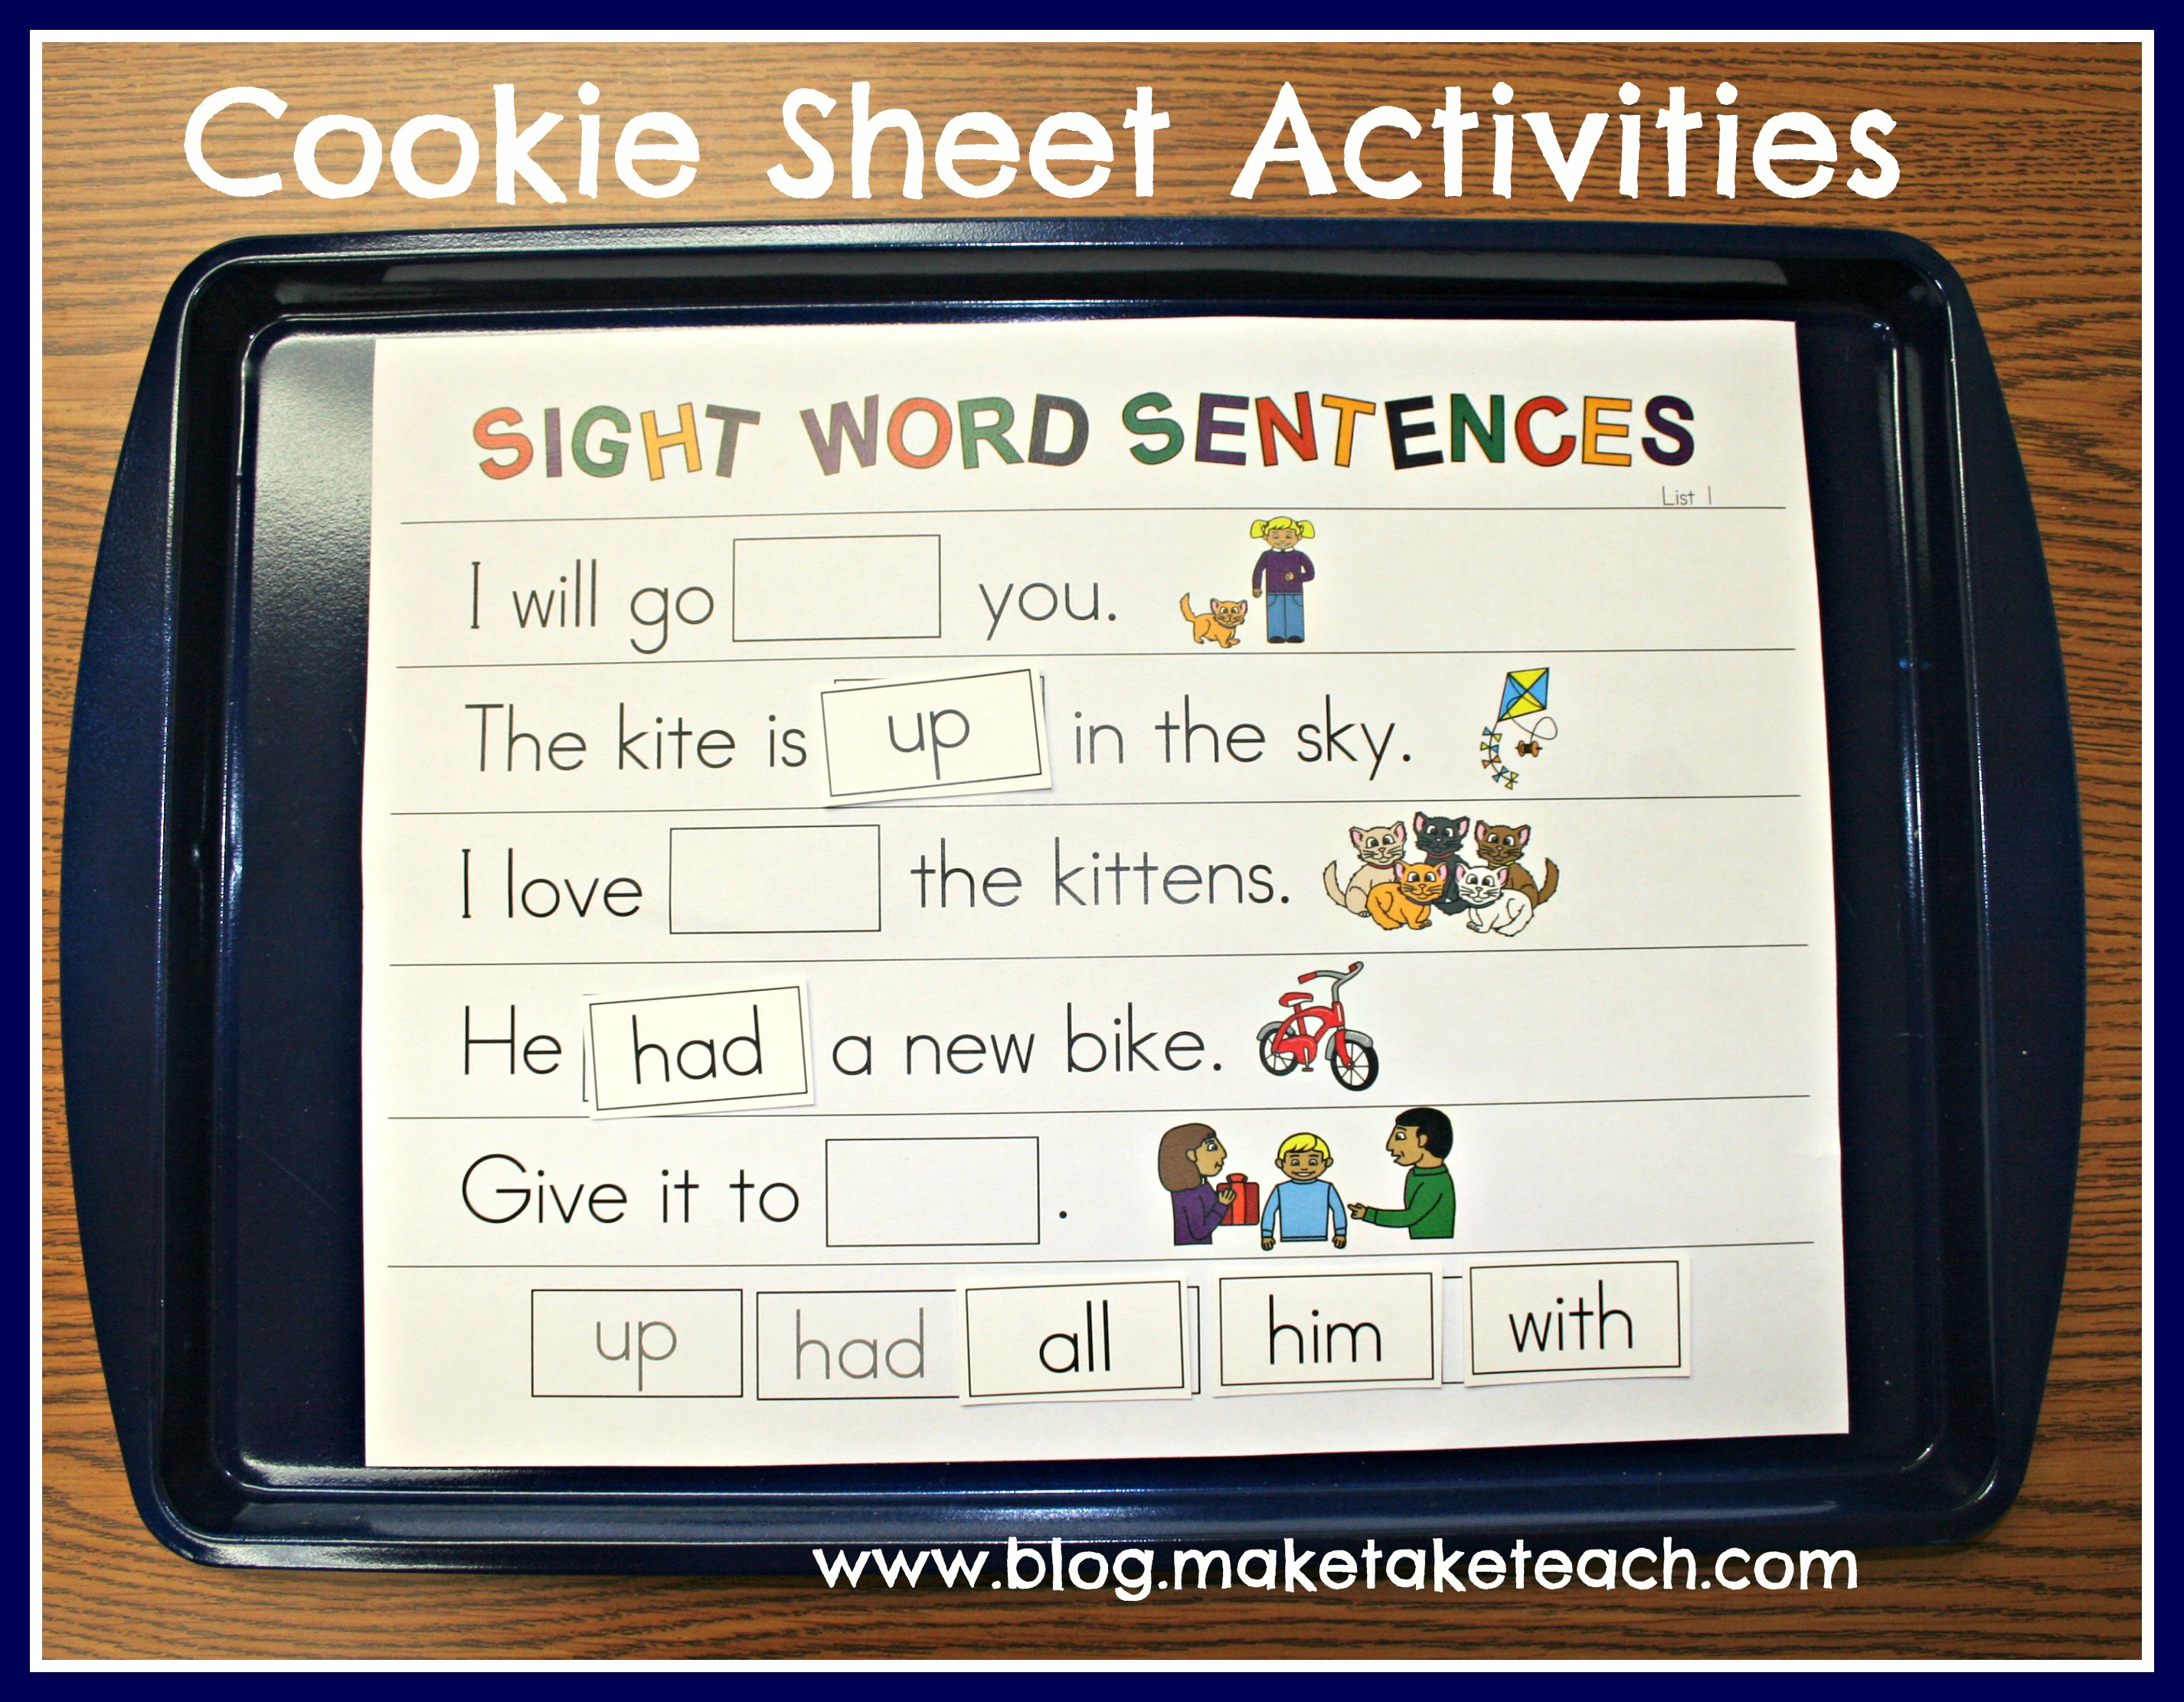 New 688 Sight Word Sentences Worksheets For Kindergarten